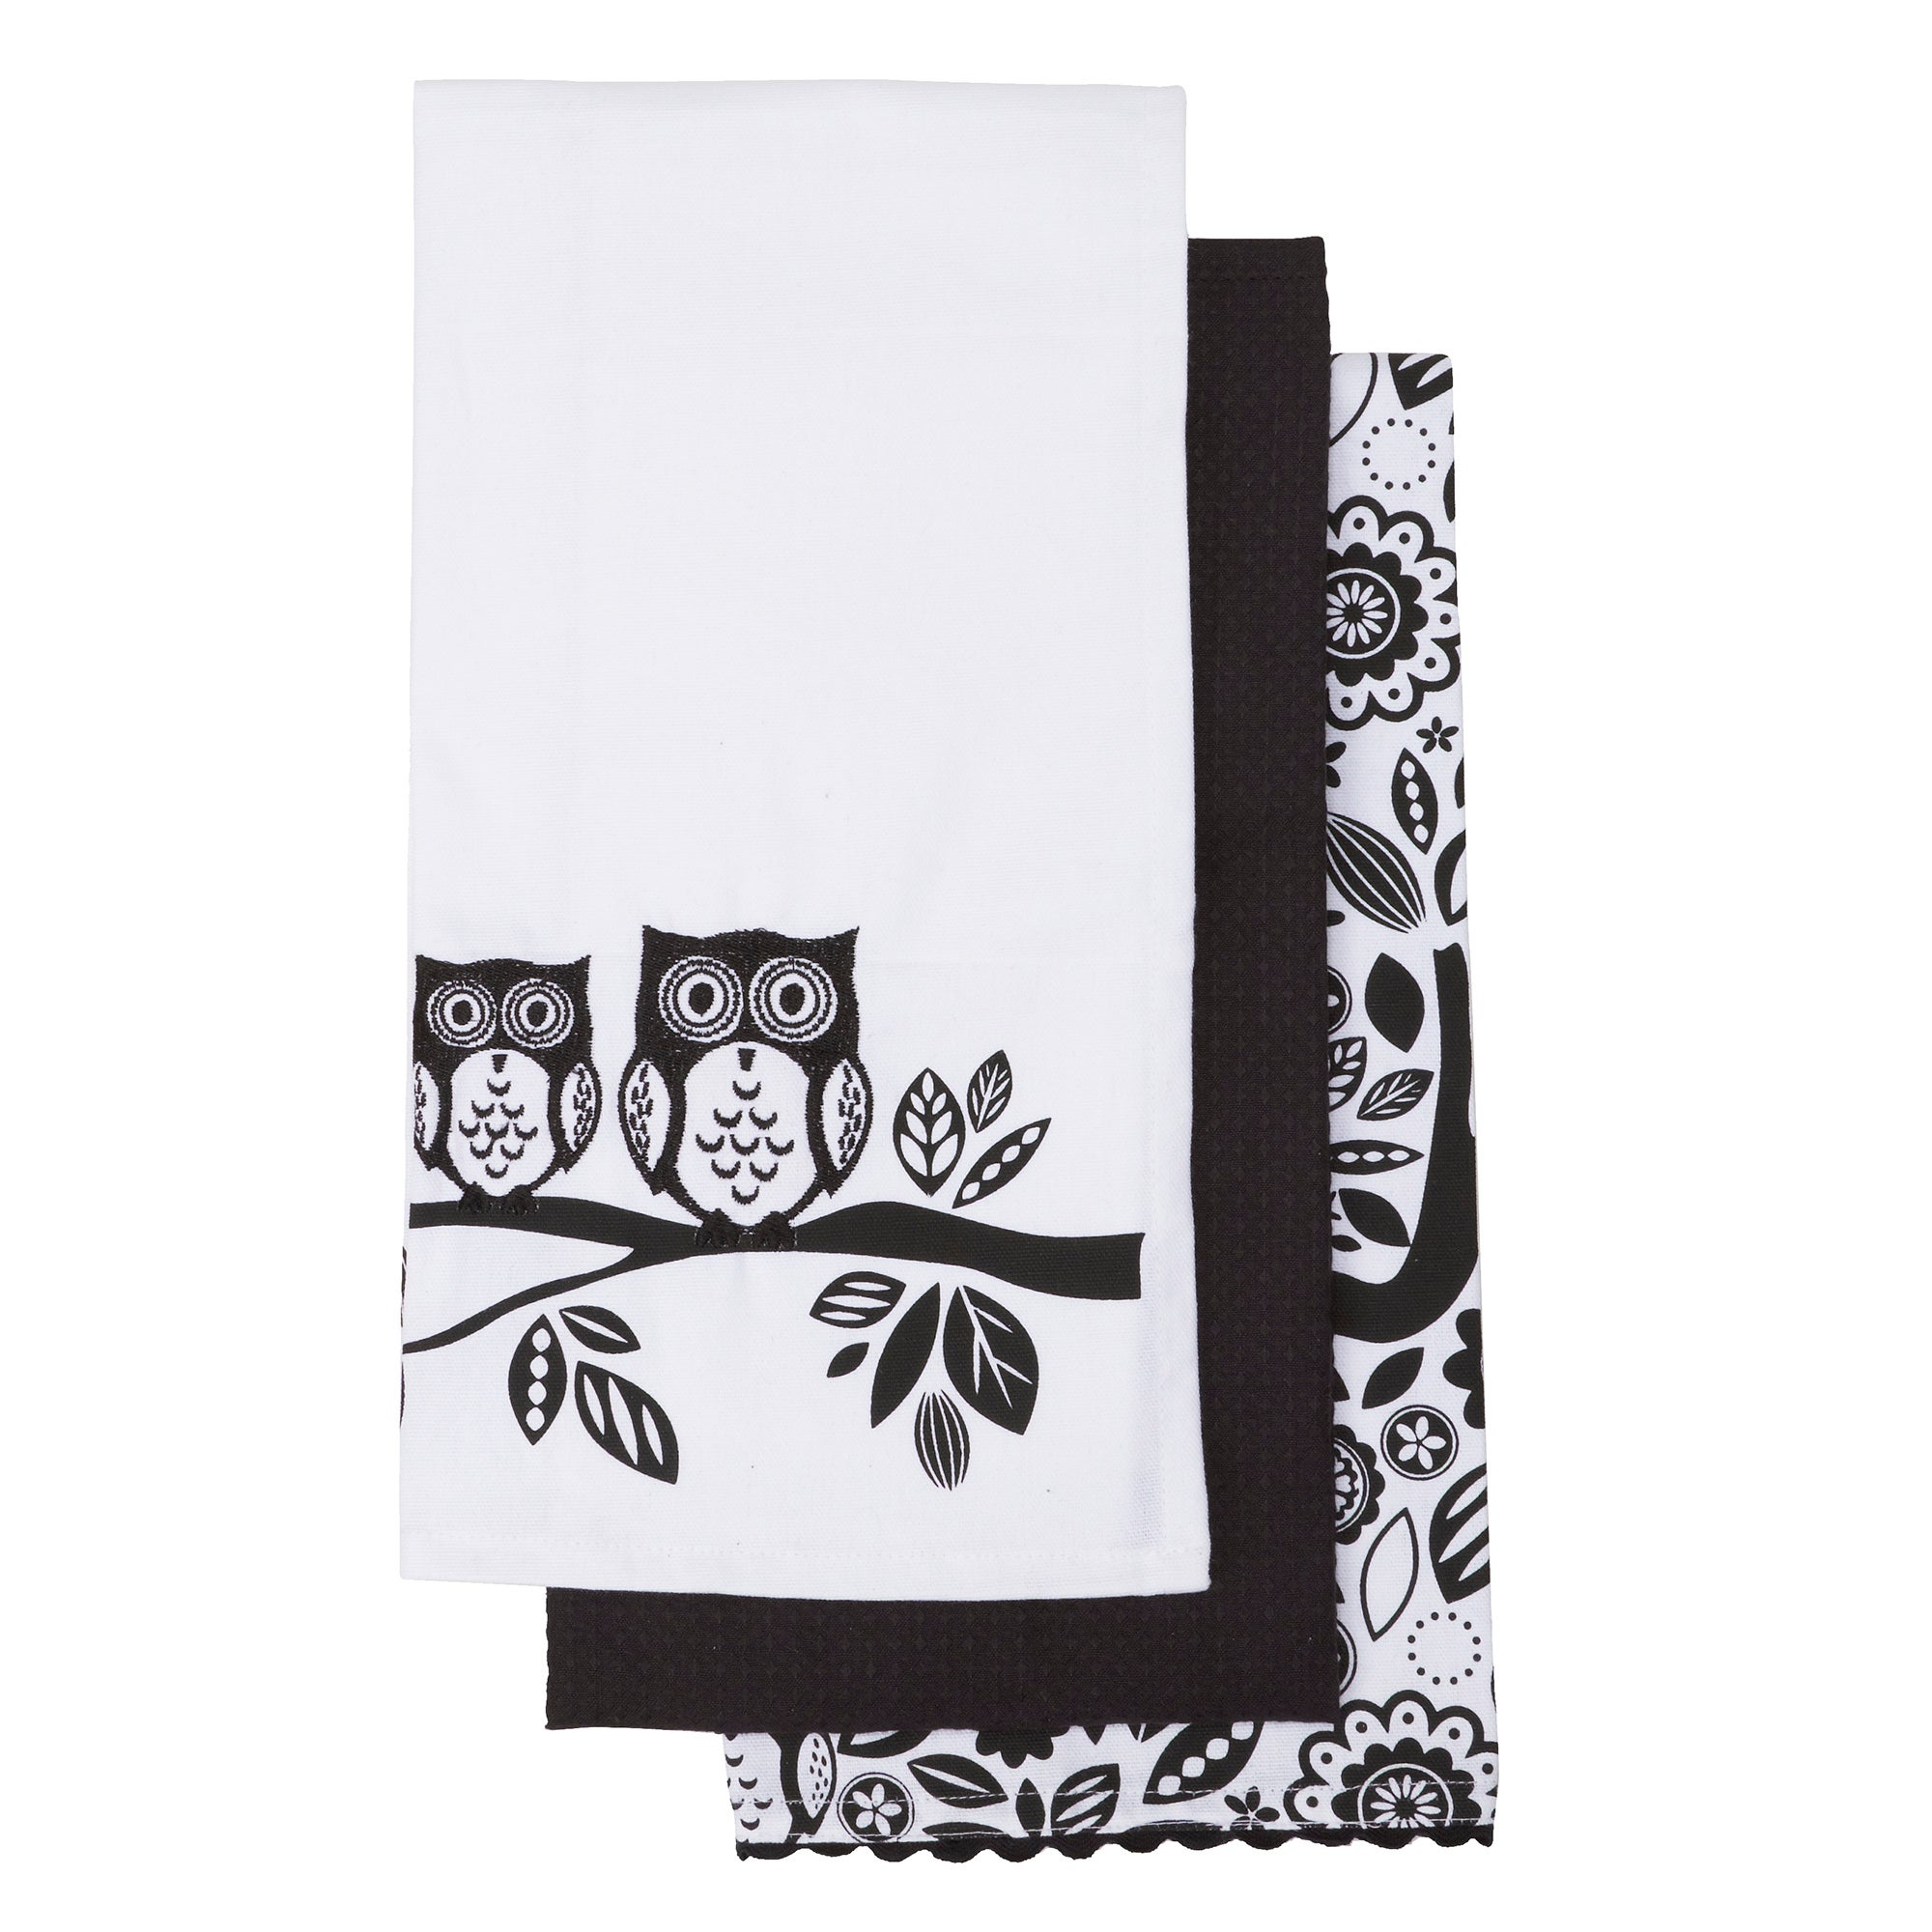 Owls Pack of 3 Tea Towels Black